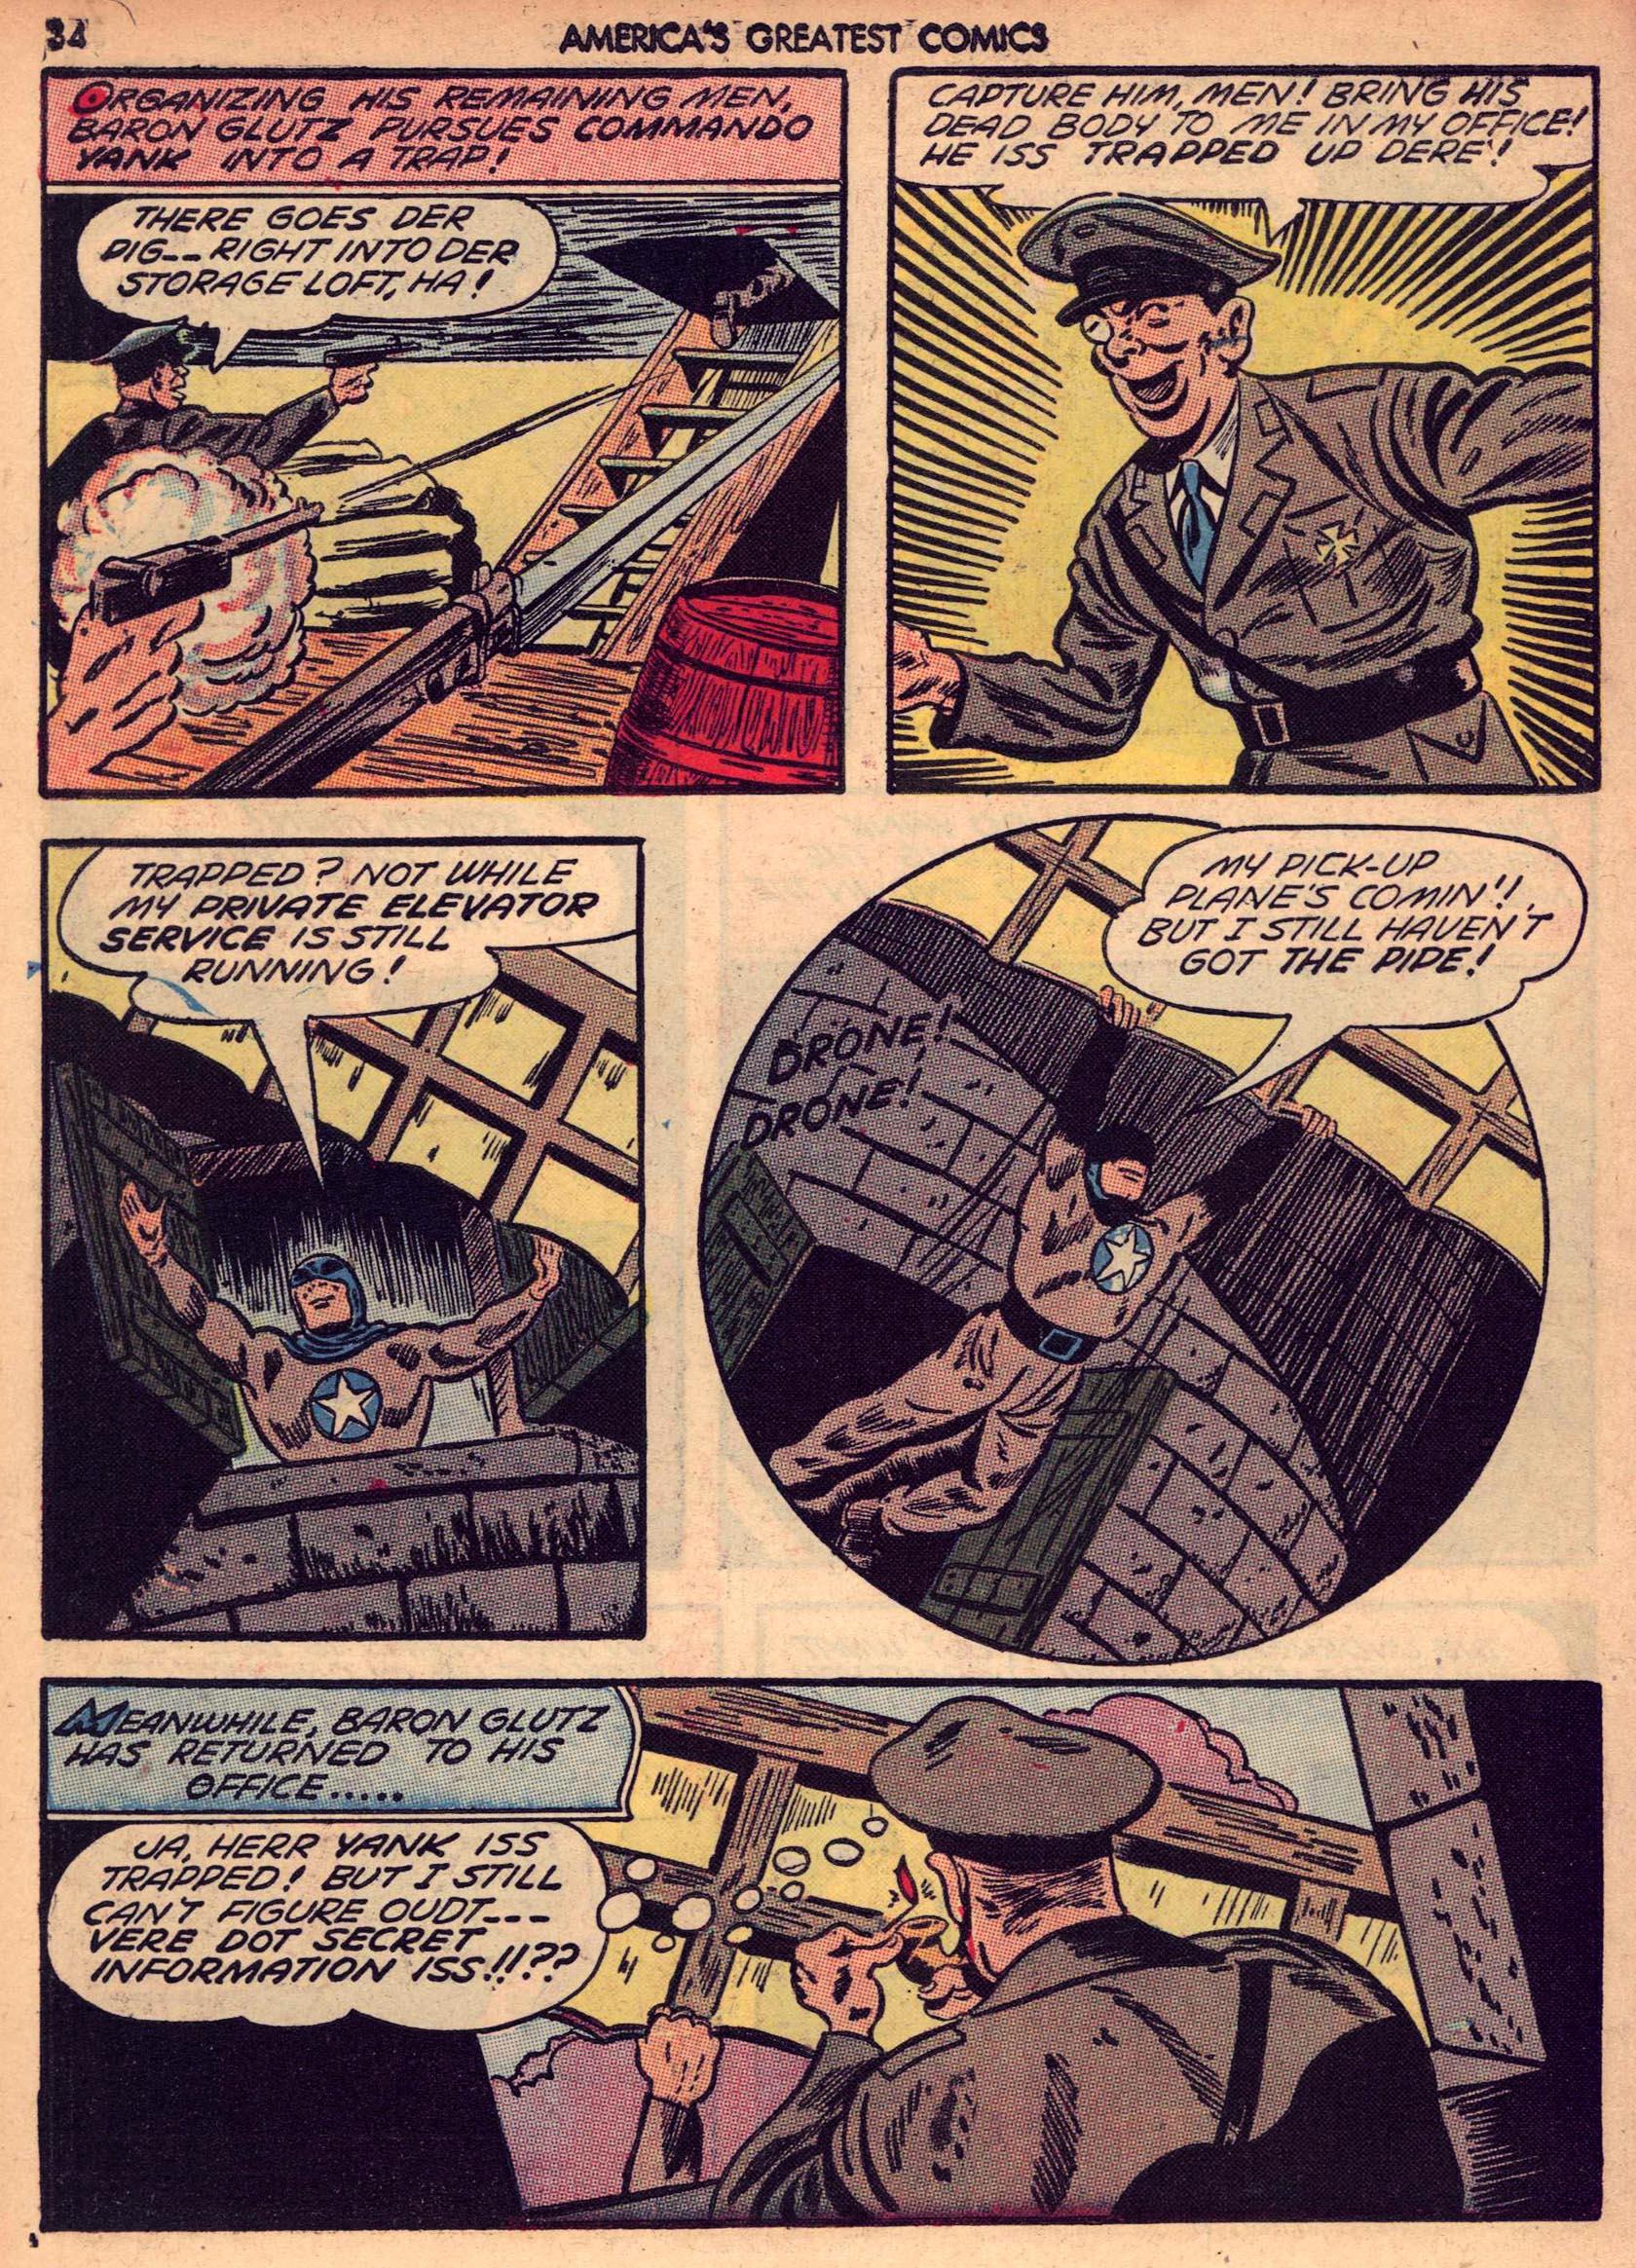 Read online America's Greatest Comics comic -  Issue #7 - 33